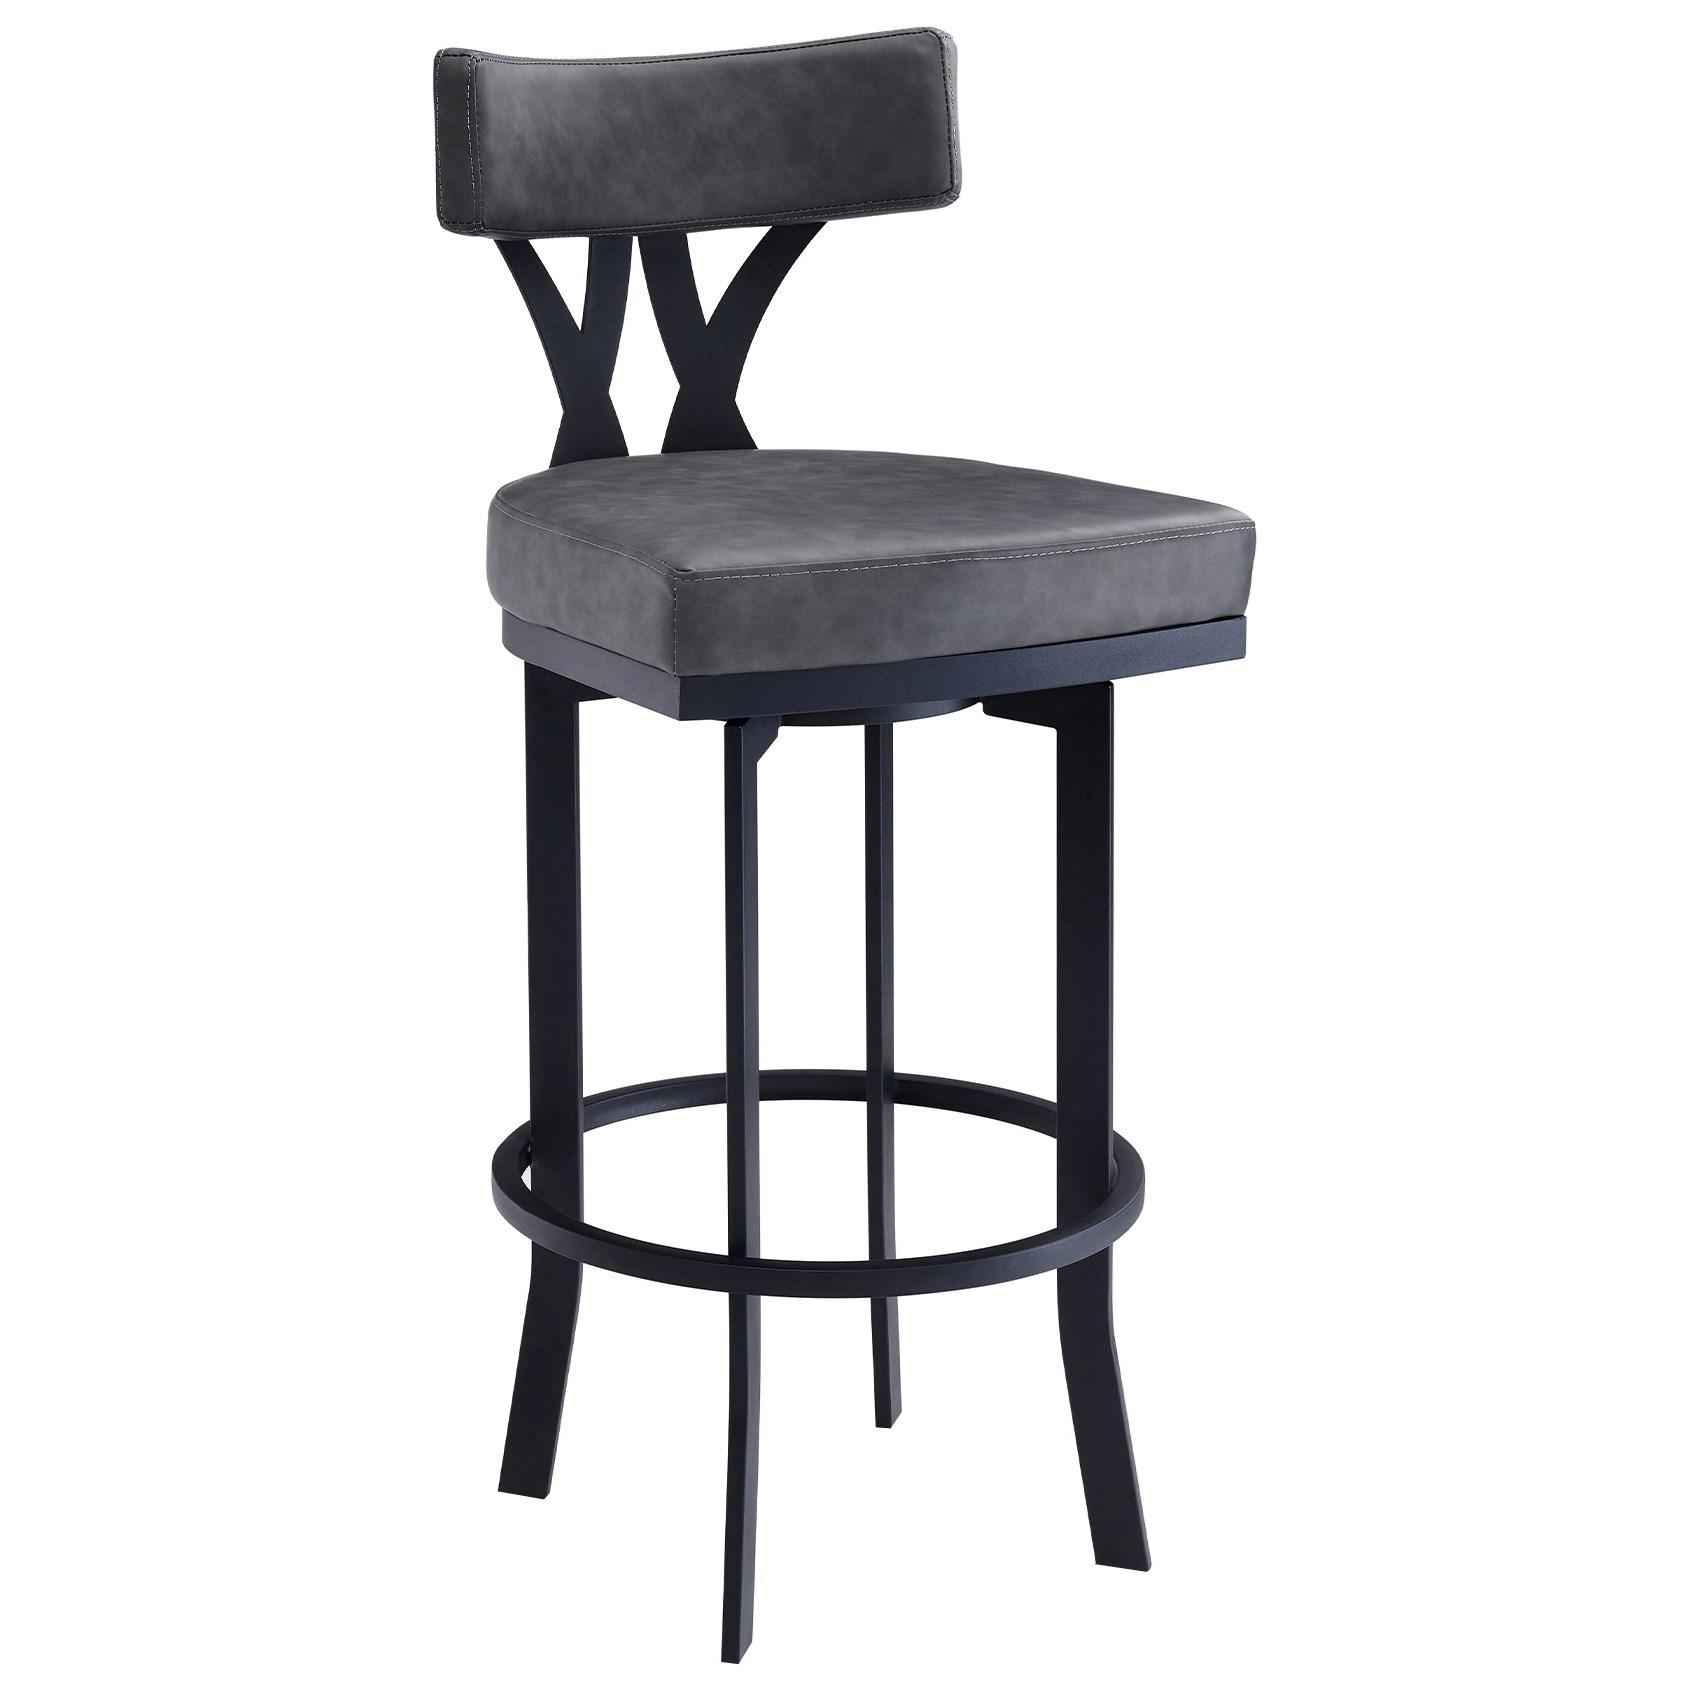 "Natalie 30"" Bar Height Barstool by Armen Living at Michael Alan Furniture & Design"